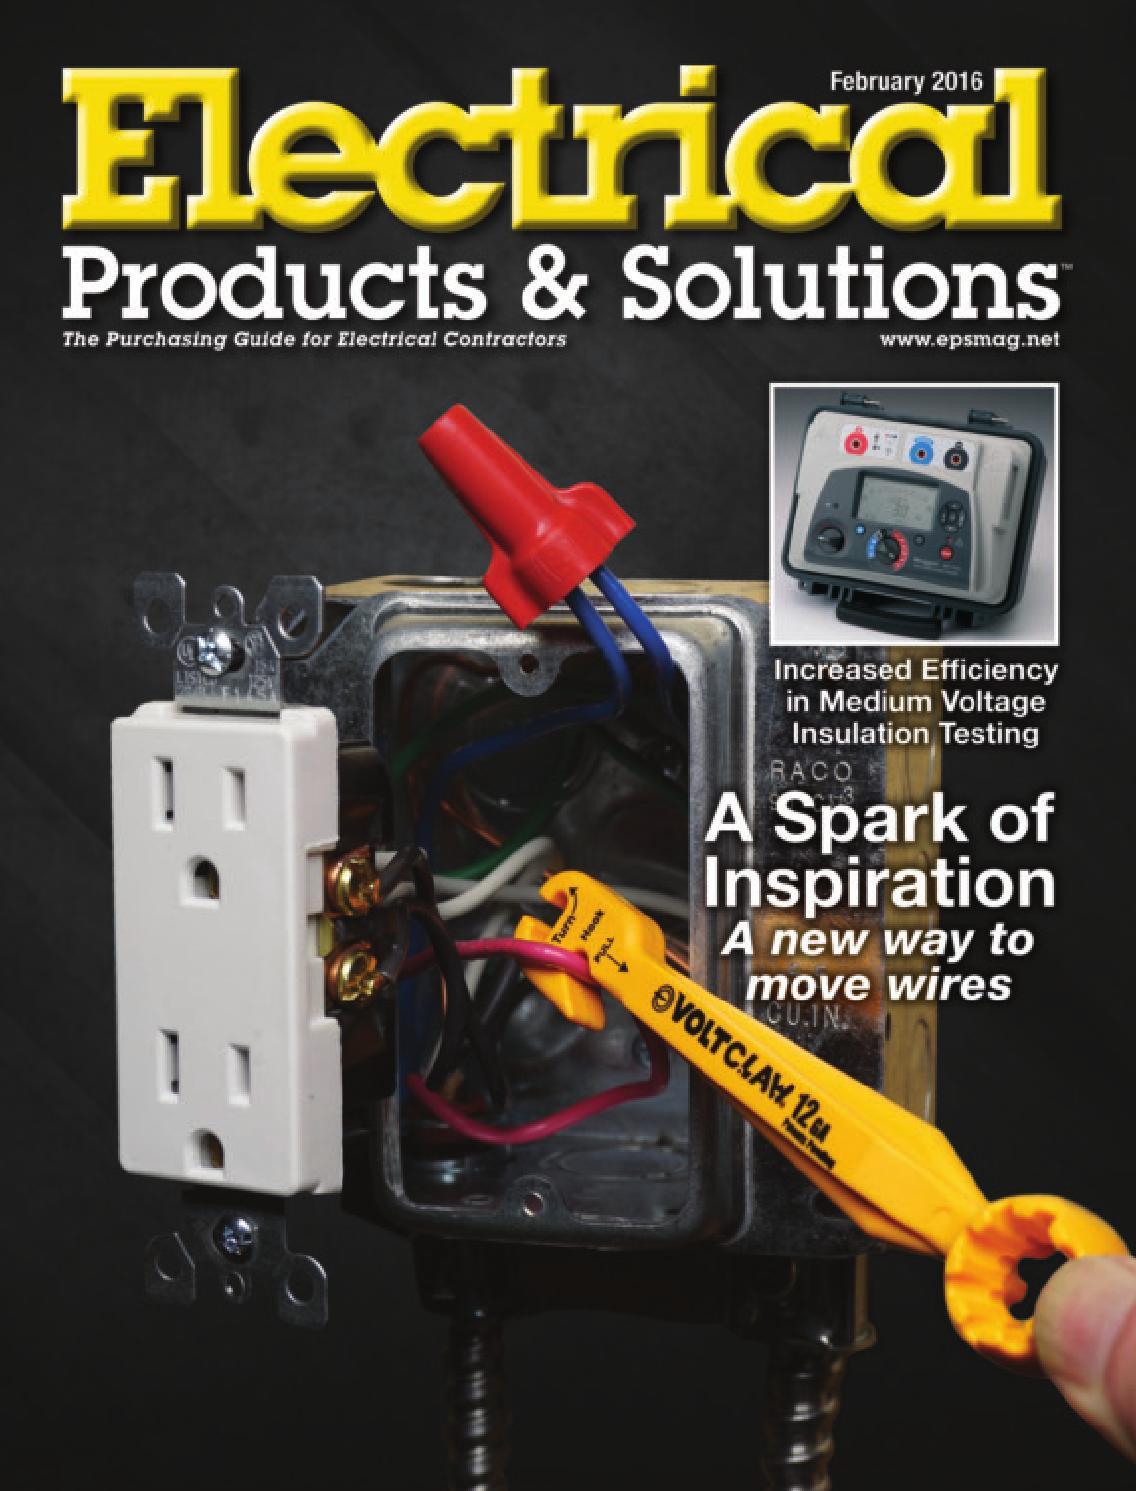 EPS Magazine February 2016 by Brian DiChiara - issuu